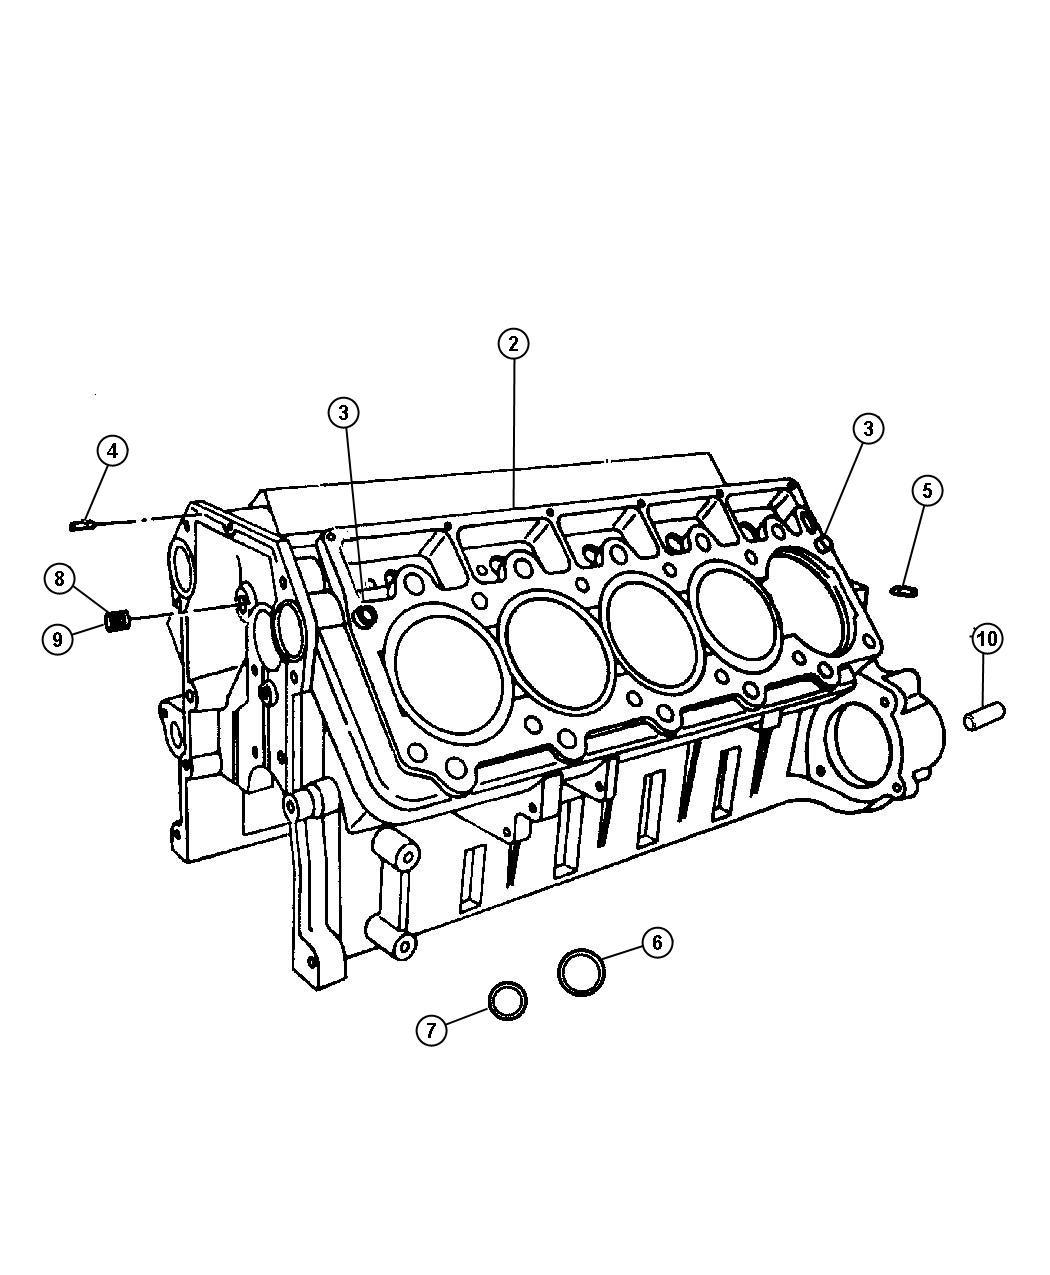 Dodge Viper Engine Long Block Export Remanufactured